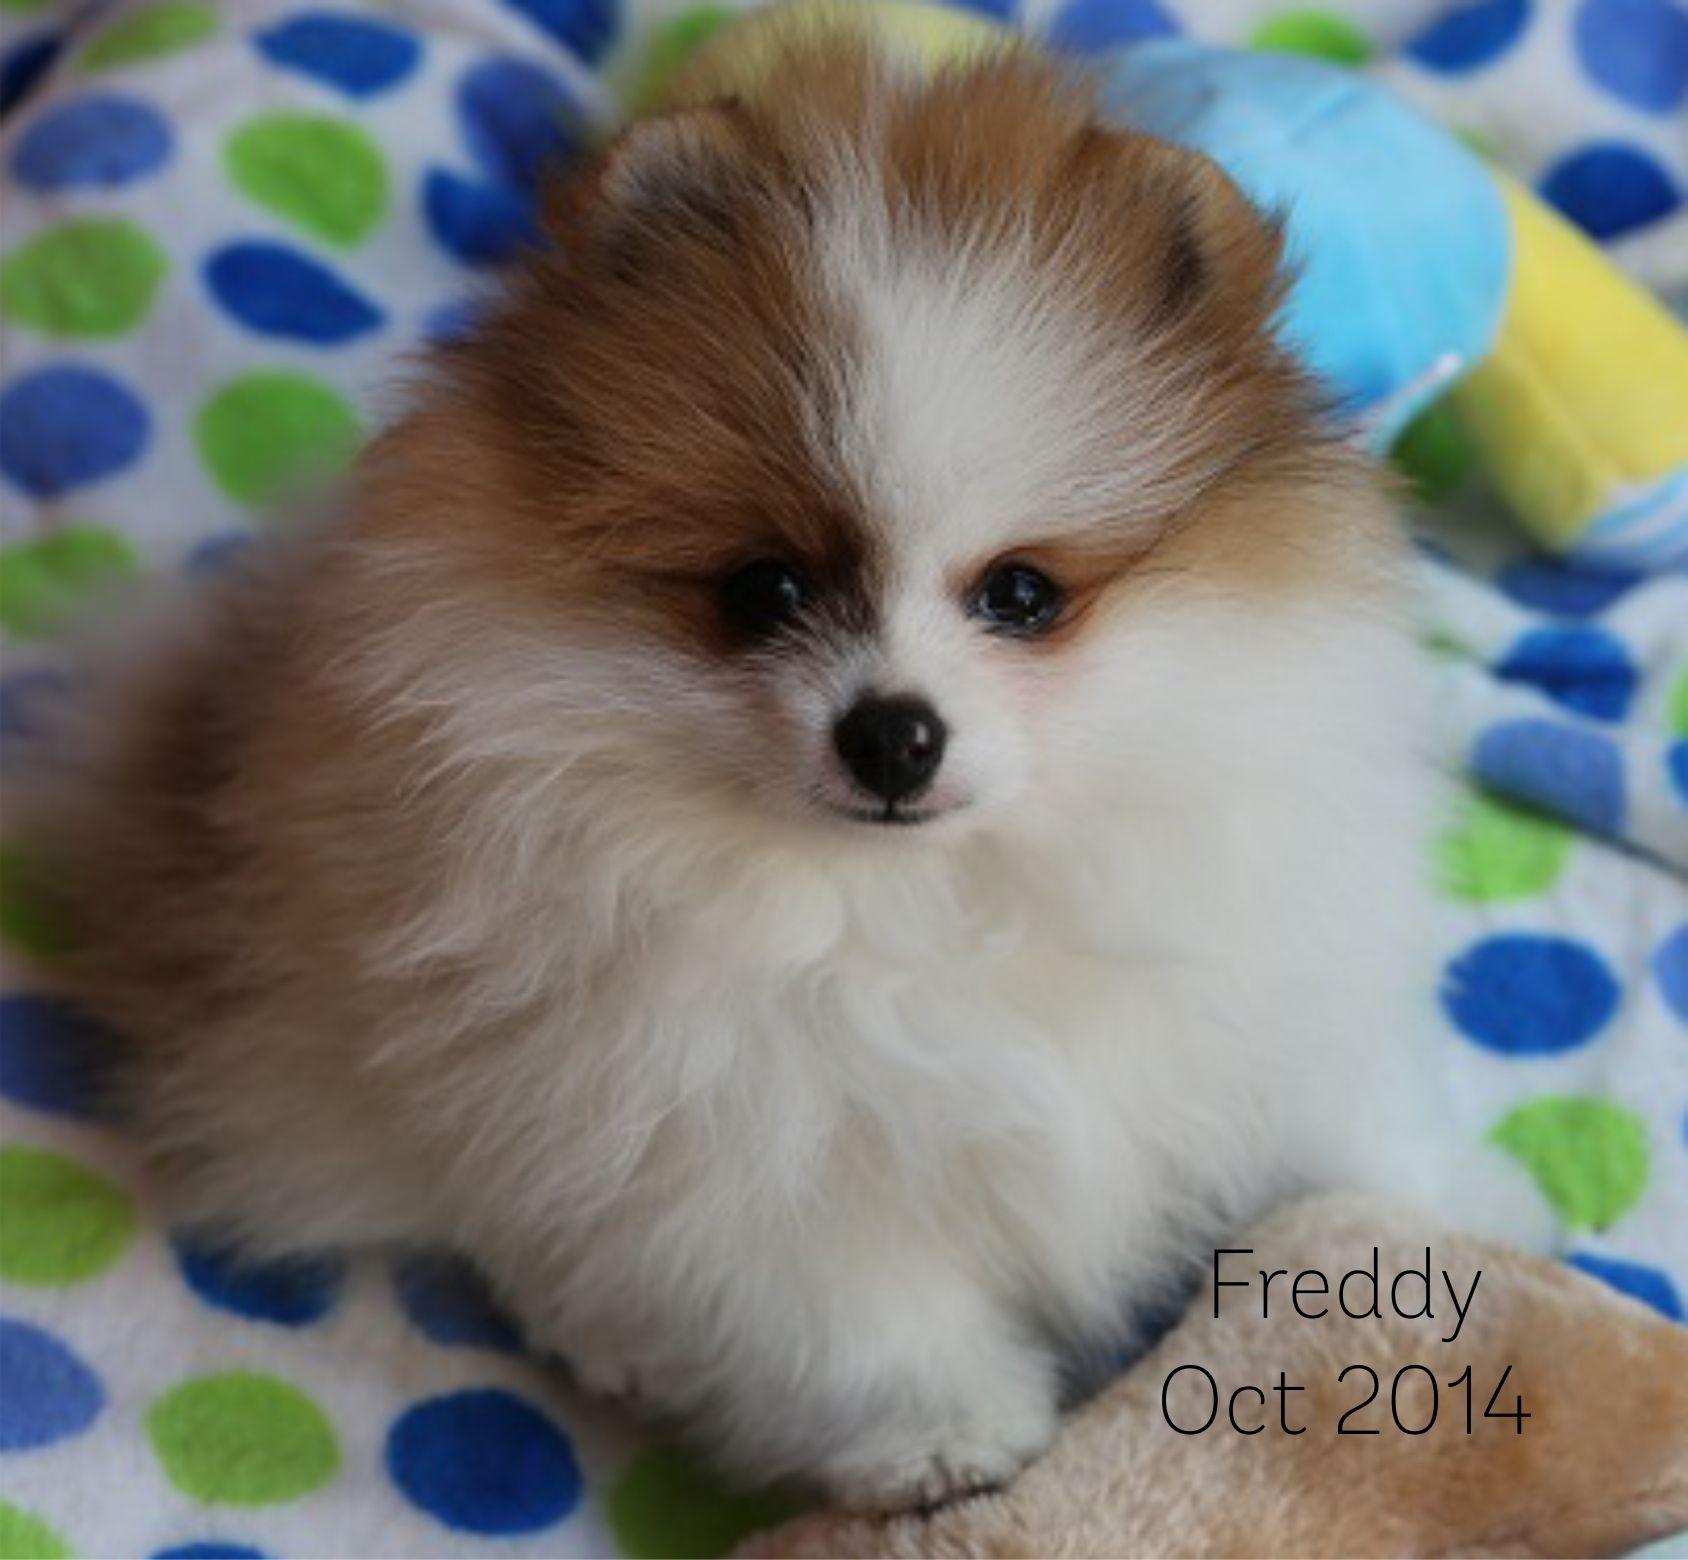 Freddy the pomeranian puppy loves spots pomeranian pinterest freddy the pomeranian puppy loves spots nvjuhfo Image collections